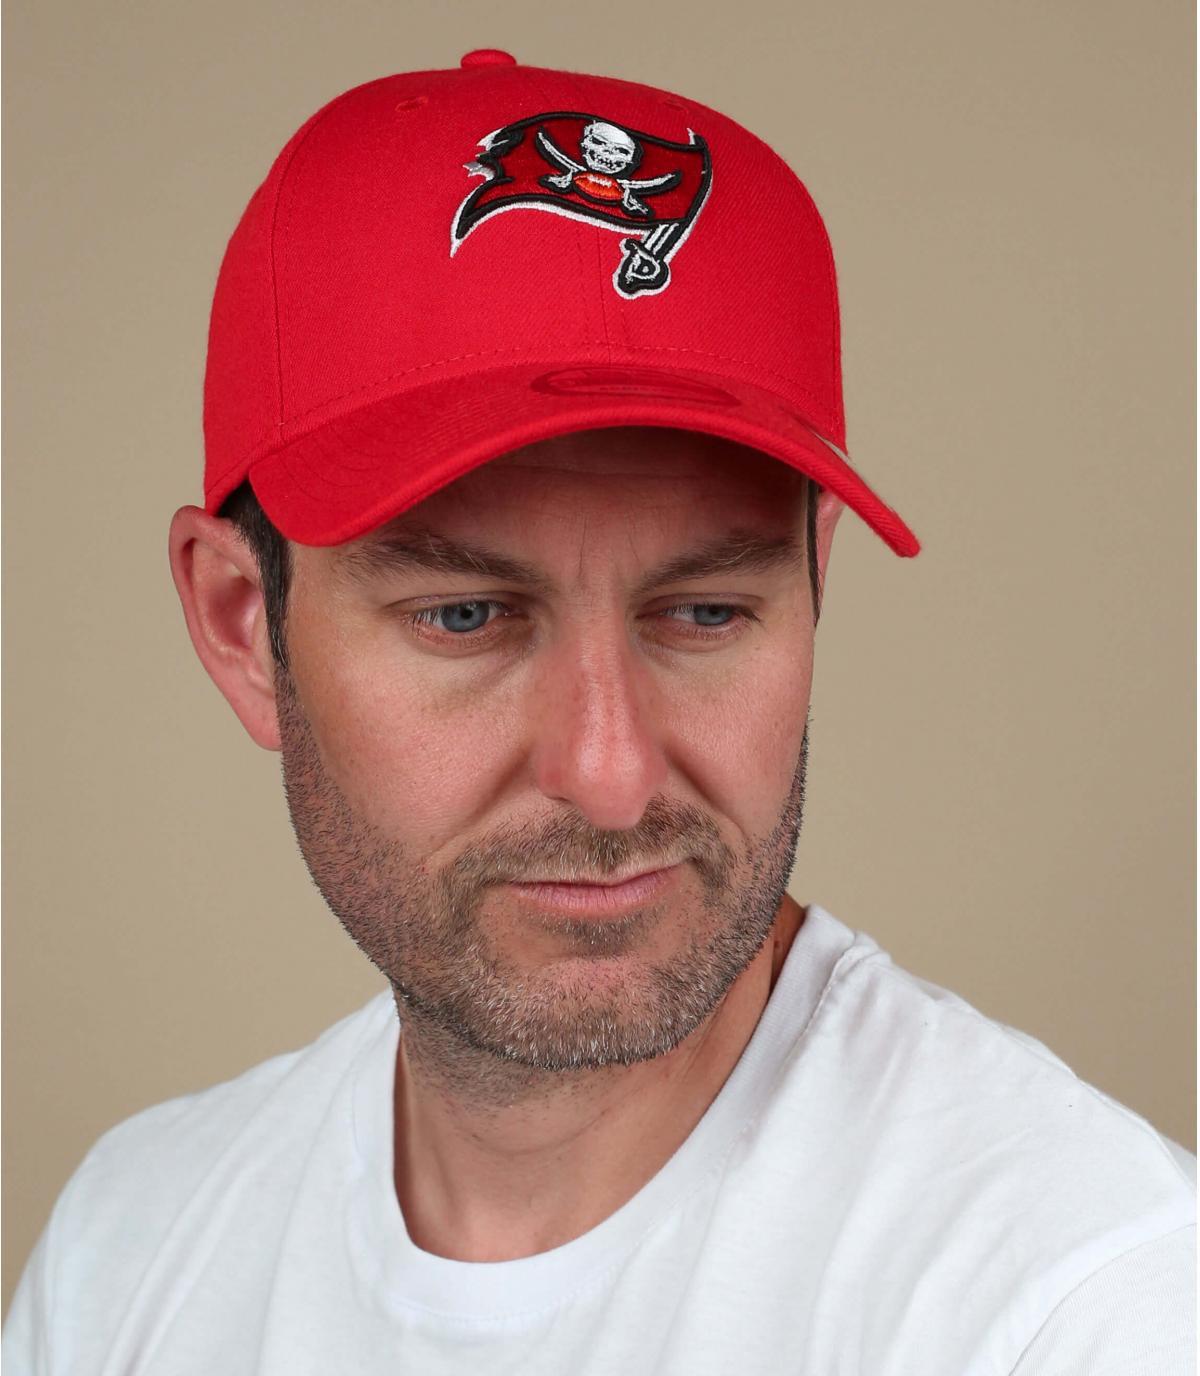 red and black Buccaneers cap.